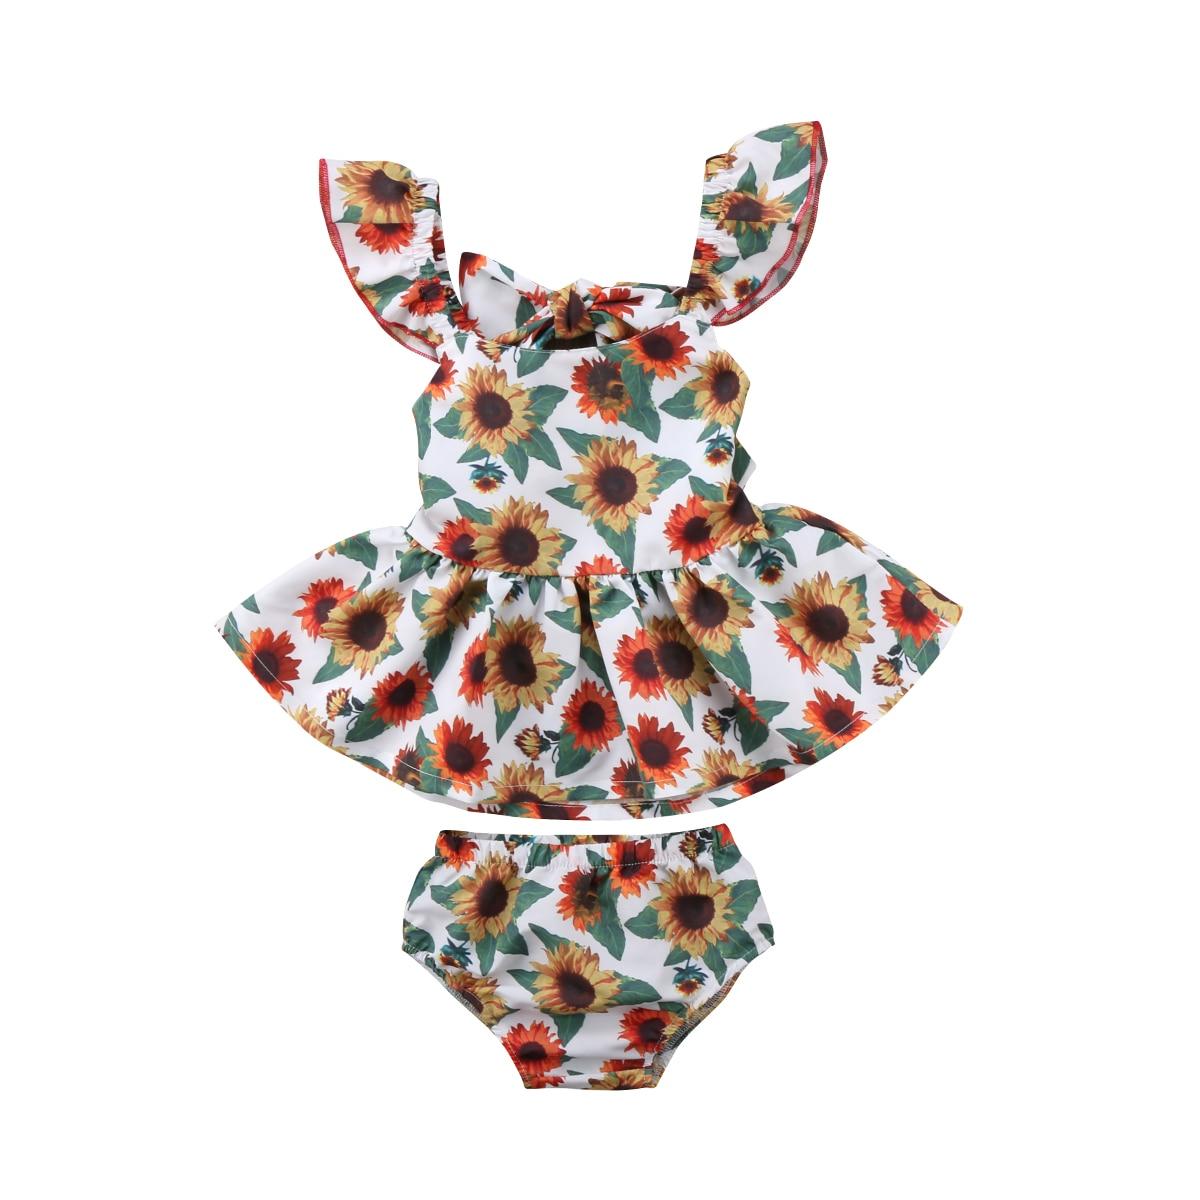 2018 Newborn Kids Baby Girls Outfits Clothes Sunflower Floral Cotton Top Dress+Bottoms 2pcs Set 0-24M